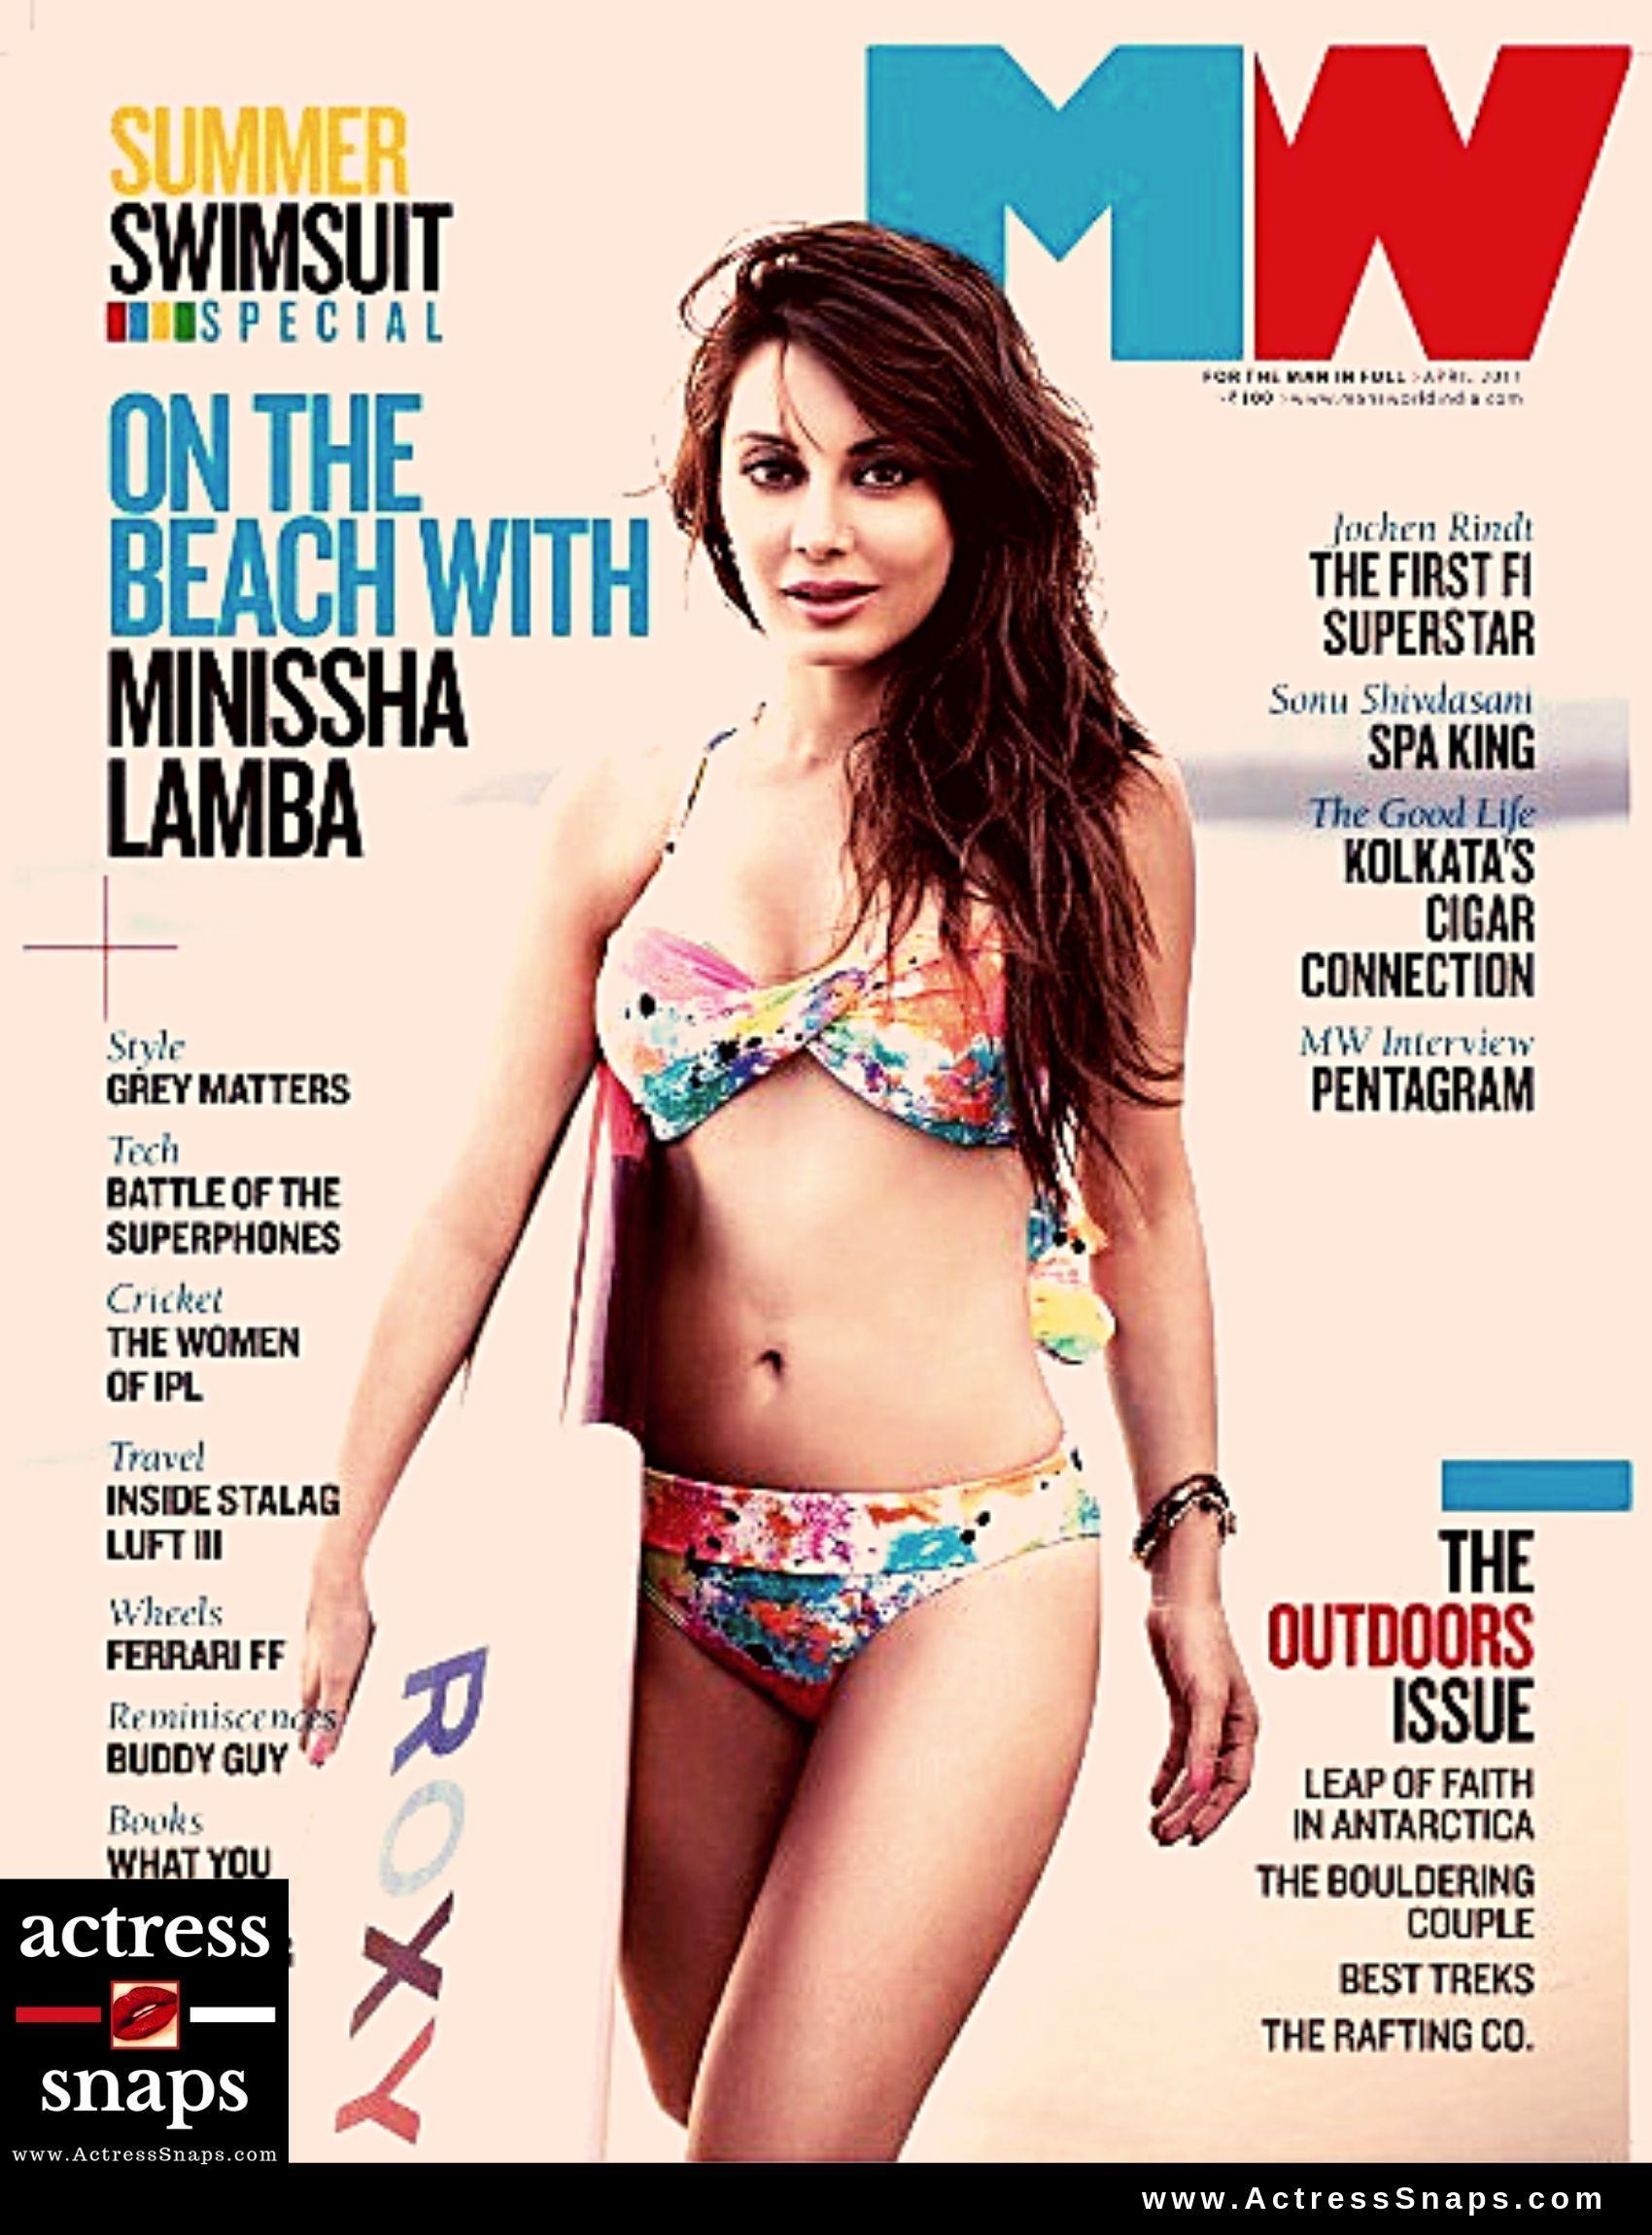 Minissha Lamba - Sexy GIFs  Photo Collections - Sexy Actress Pictures | Hot Actress Pictures - ActressSnaps.com